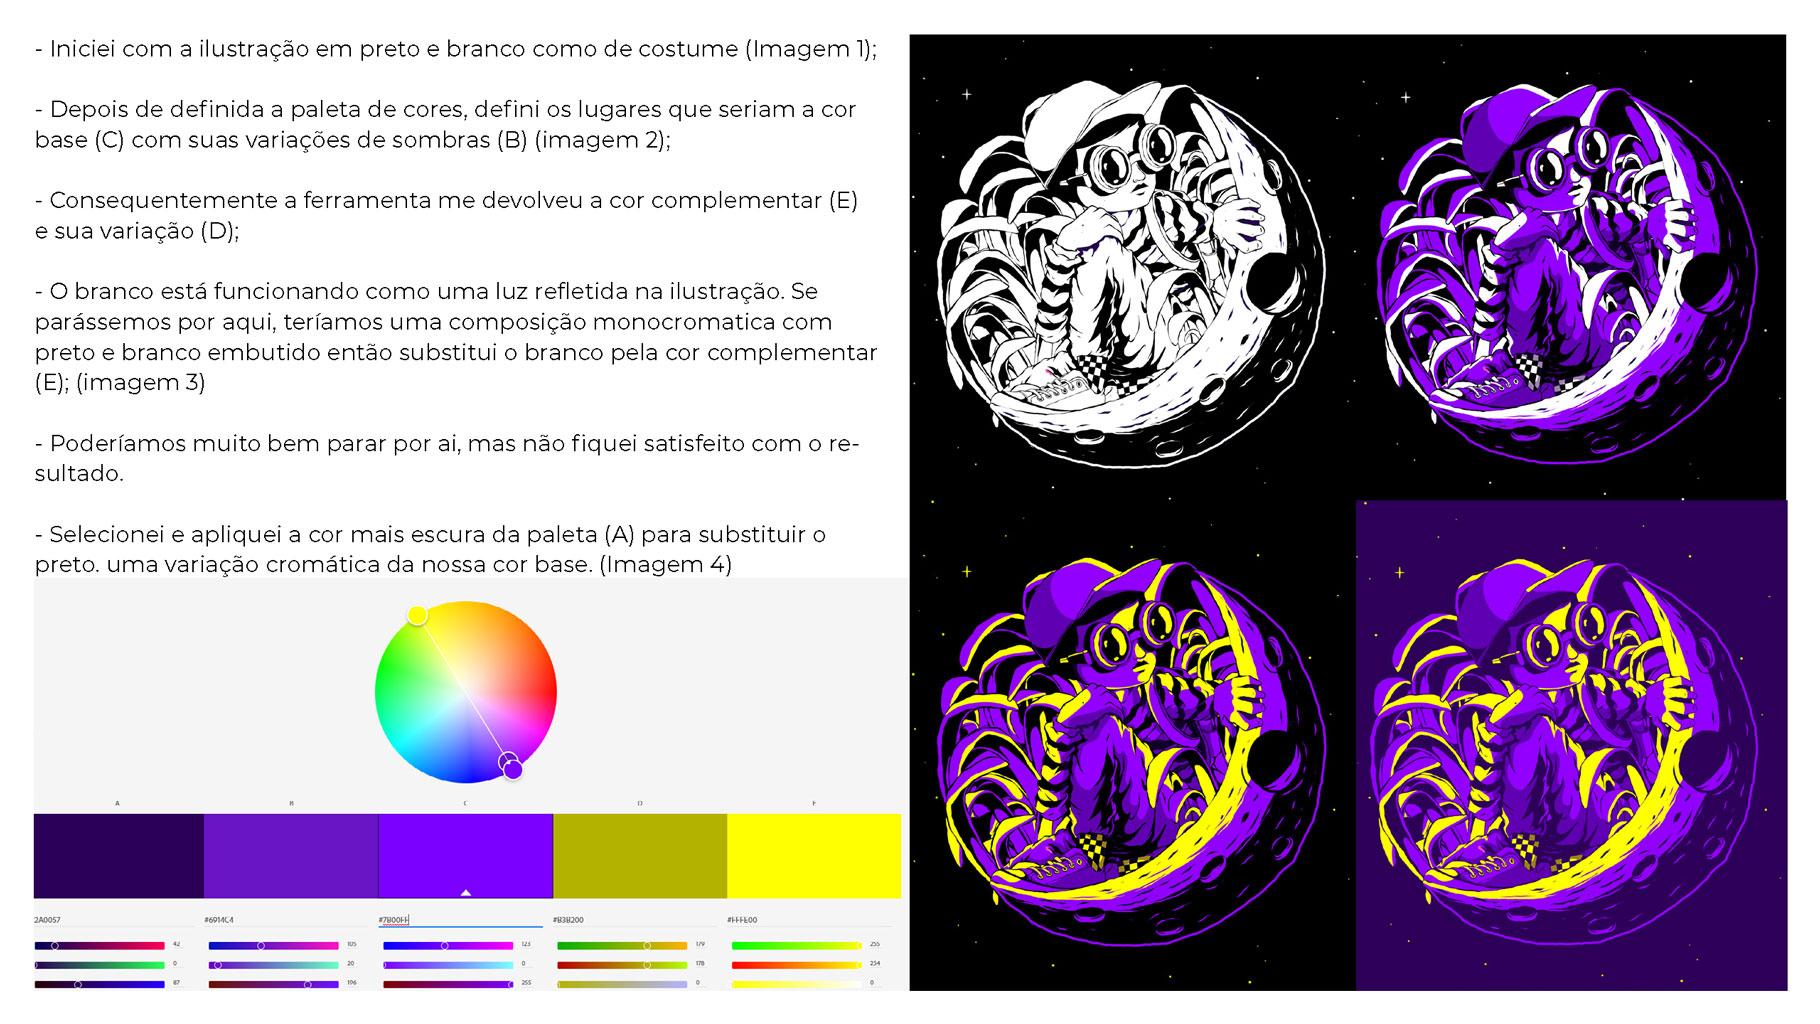 [淘宝购买] 300款色彩亮丽蒸汽波风动画绘画色板色轮模板素材 300 Color Swatches For Adobe Illustrator & Adobe Photoshop插图(15)